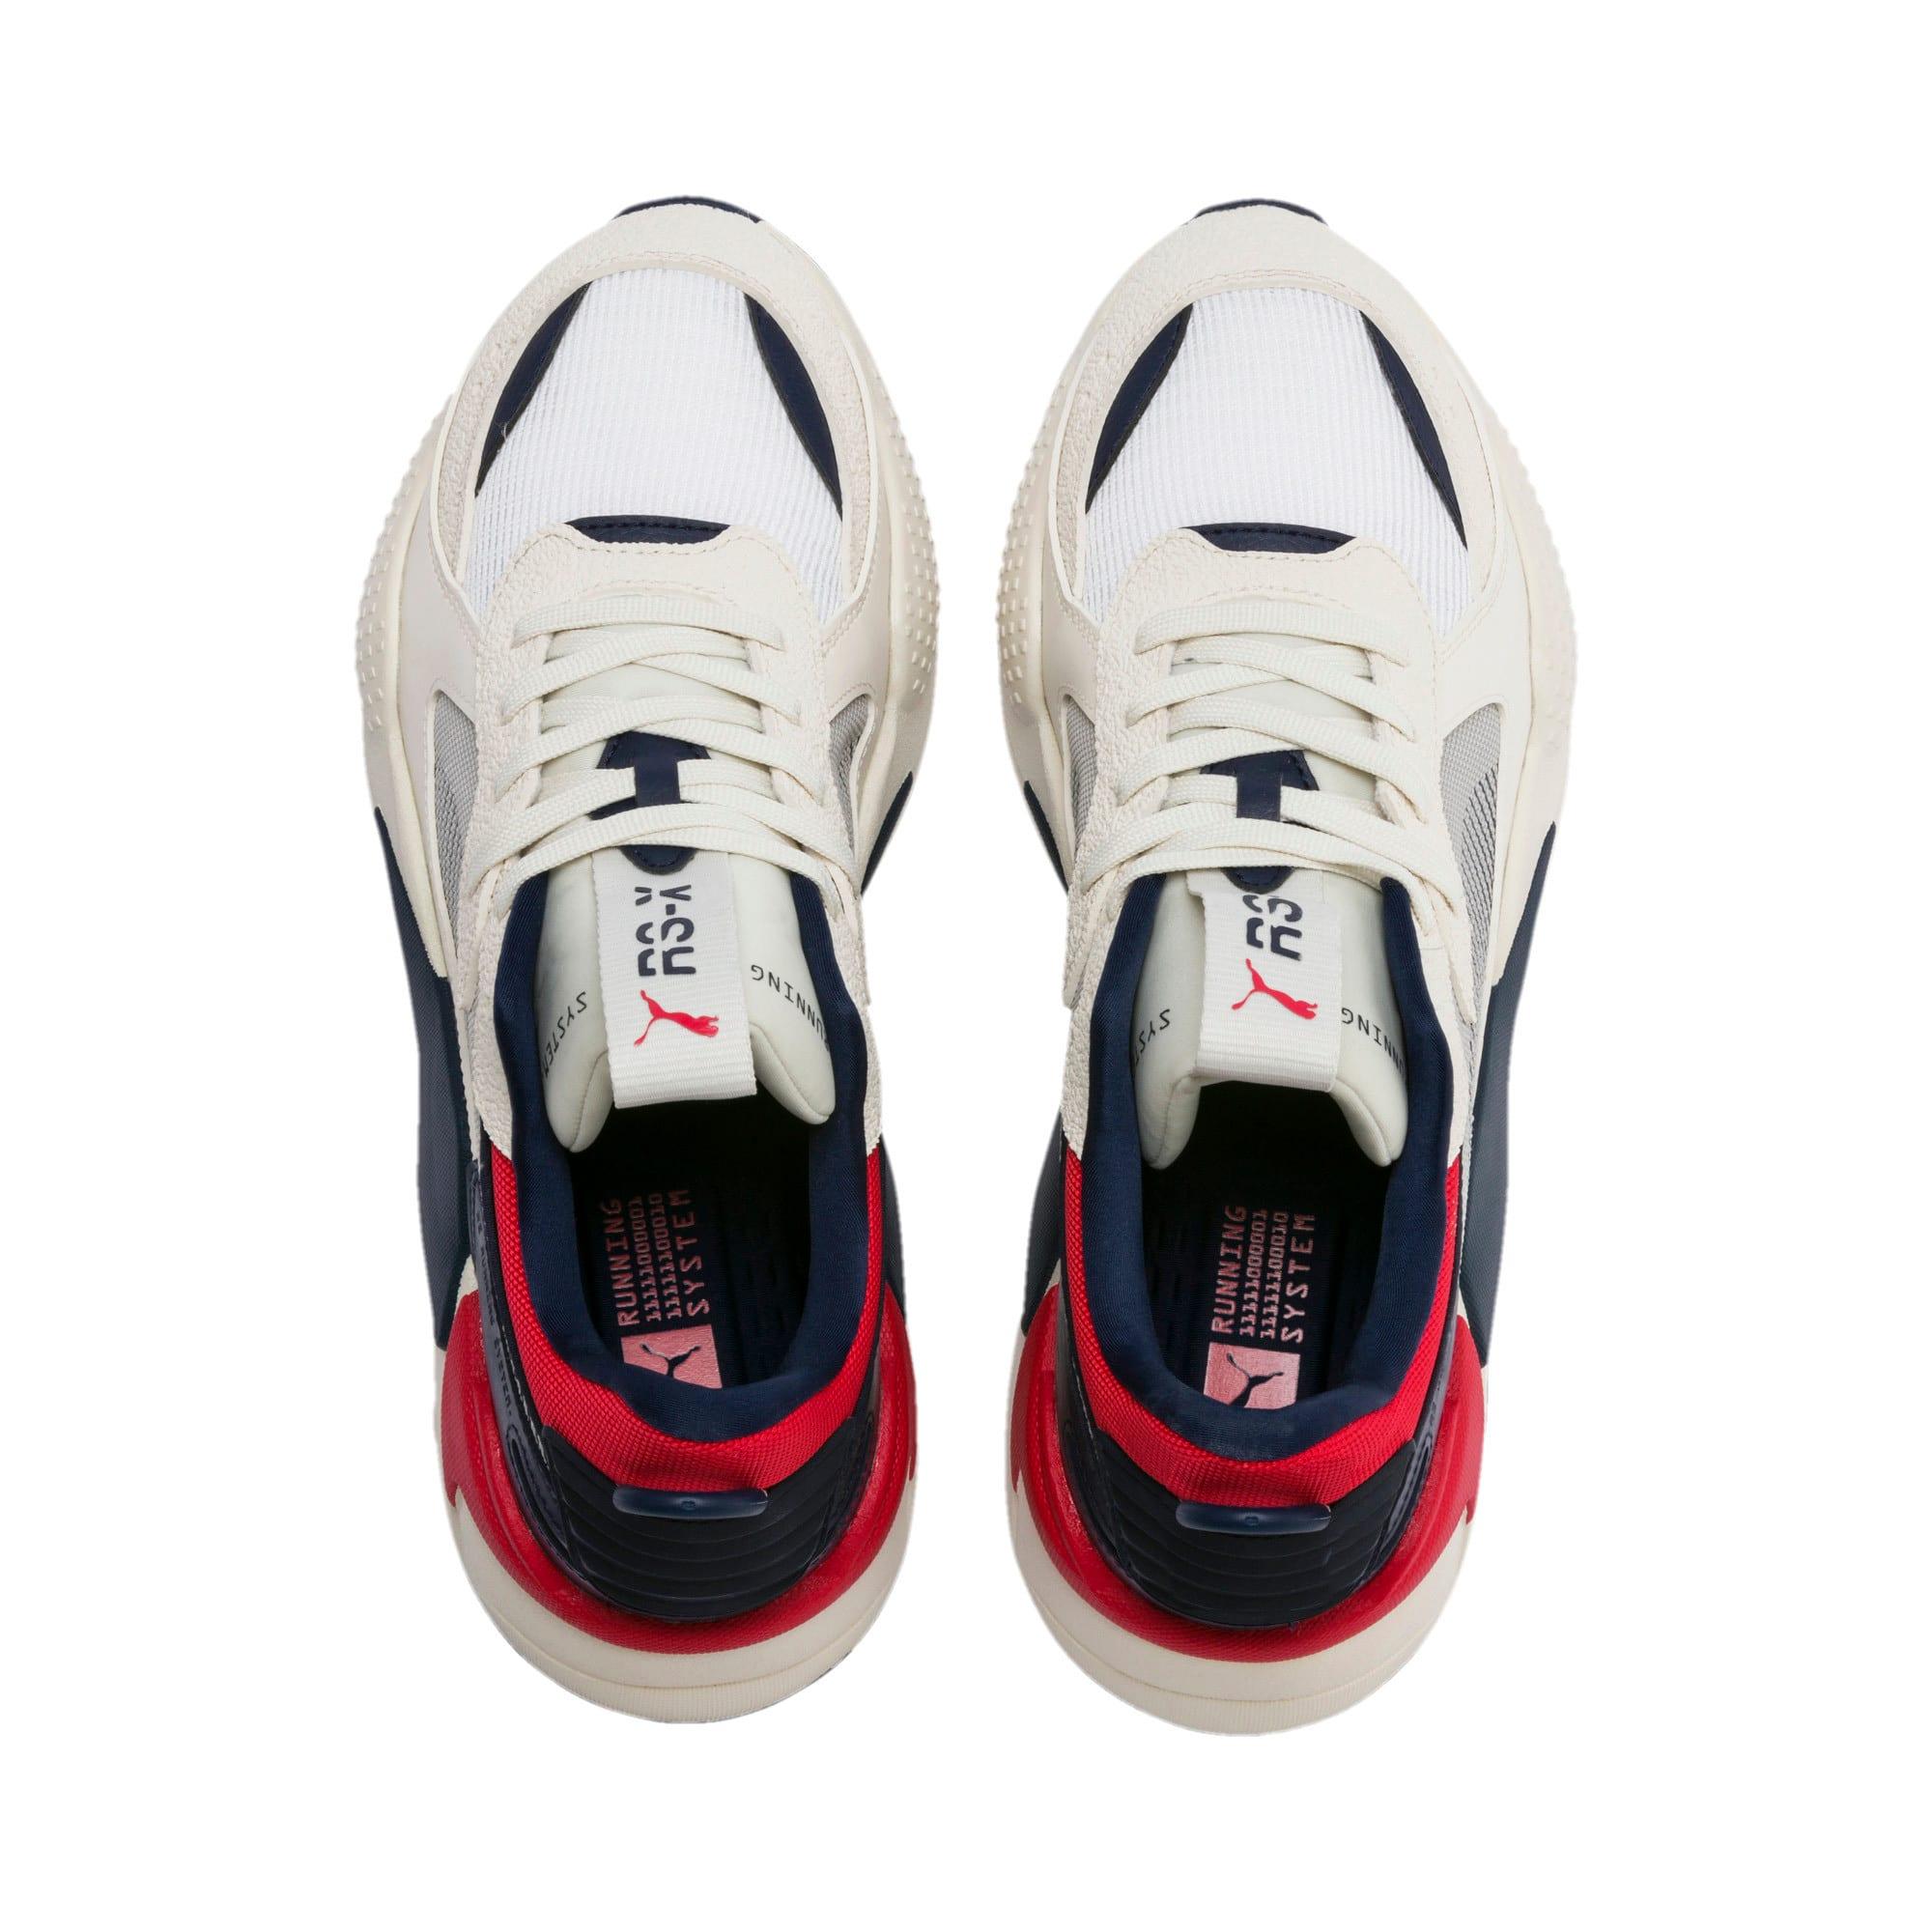 Thumbnail 7 of RS-X Hard Drive Sneaker, Whisper White-Peacoat, medium